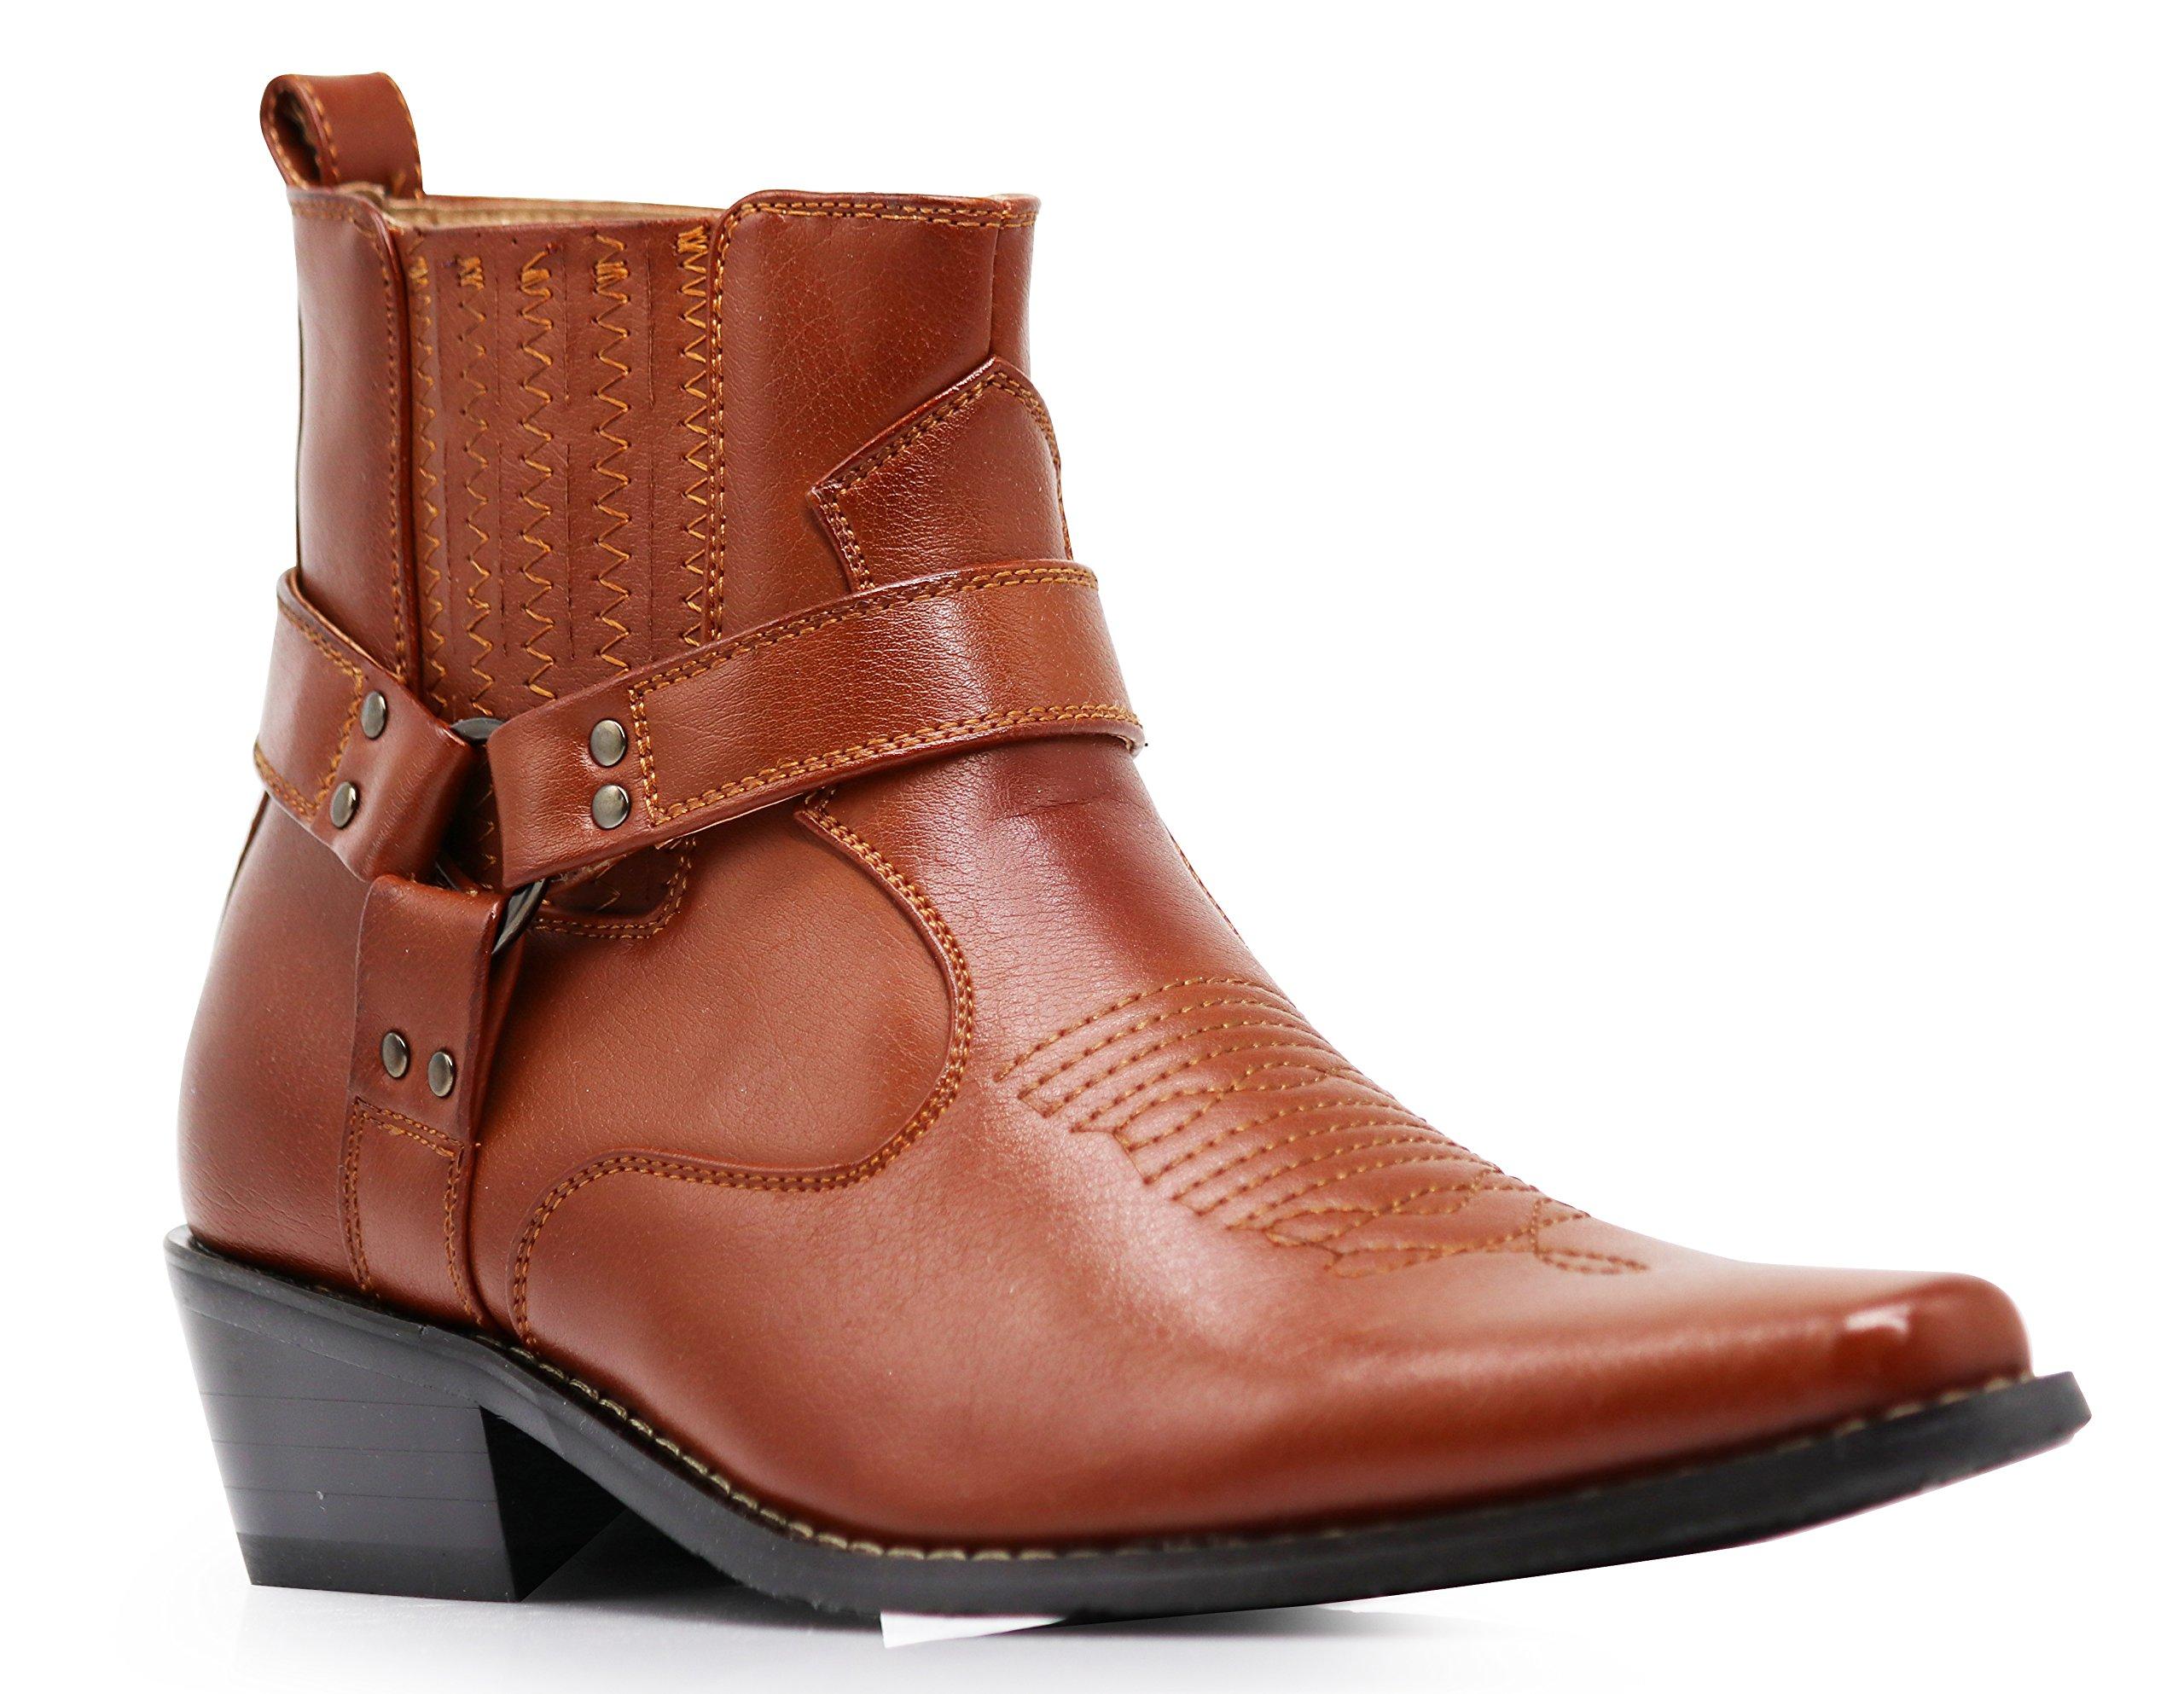 Alberto Fellini Men's Western Boots (West01) (Brown, 8.5)